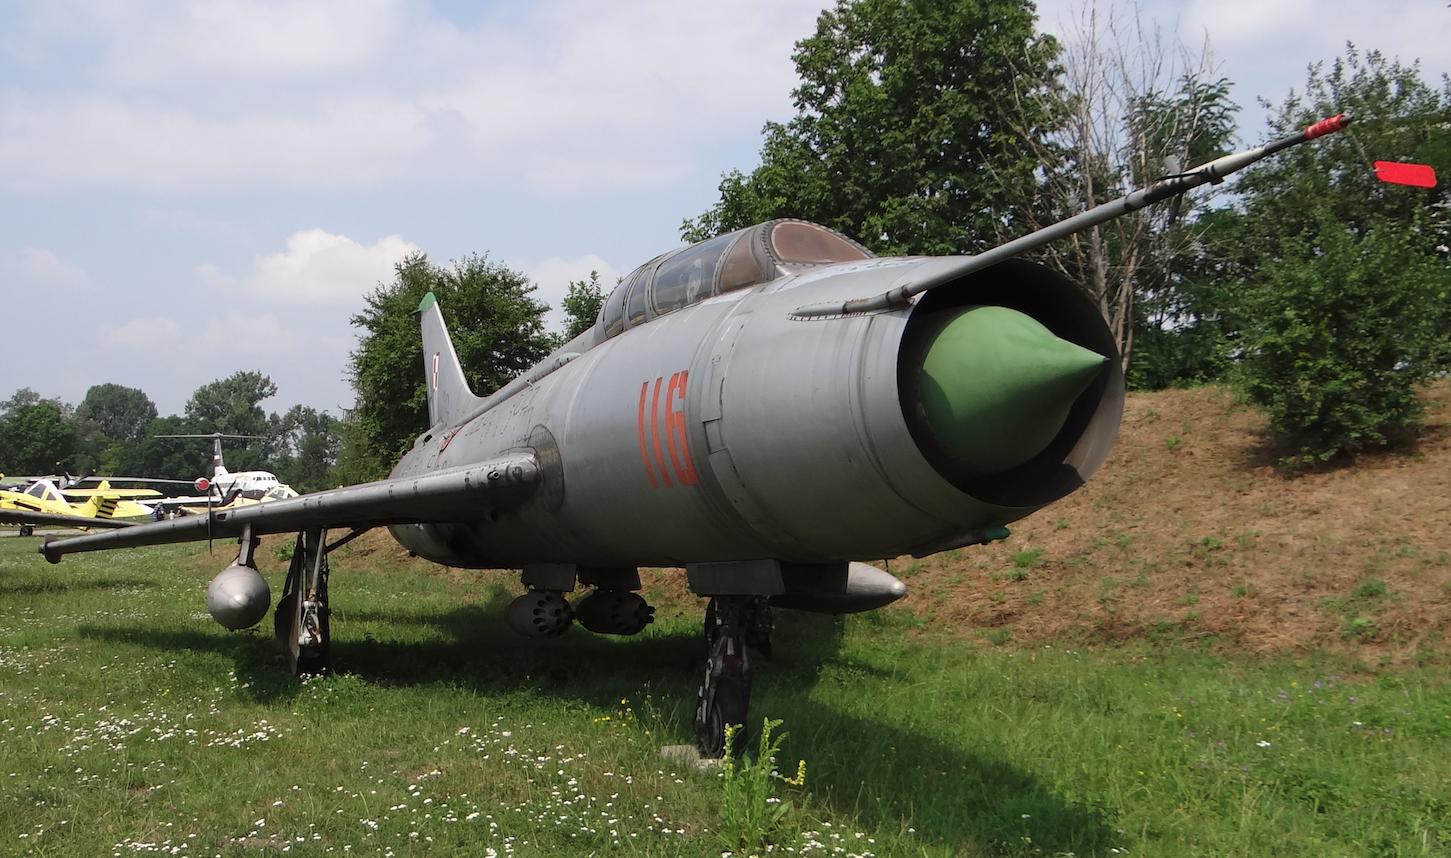 Suchoj Su-7 U nb 116. 2017 year. Photo by Karol Placha Hetman